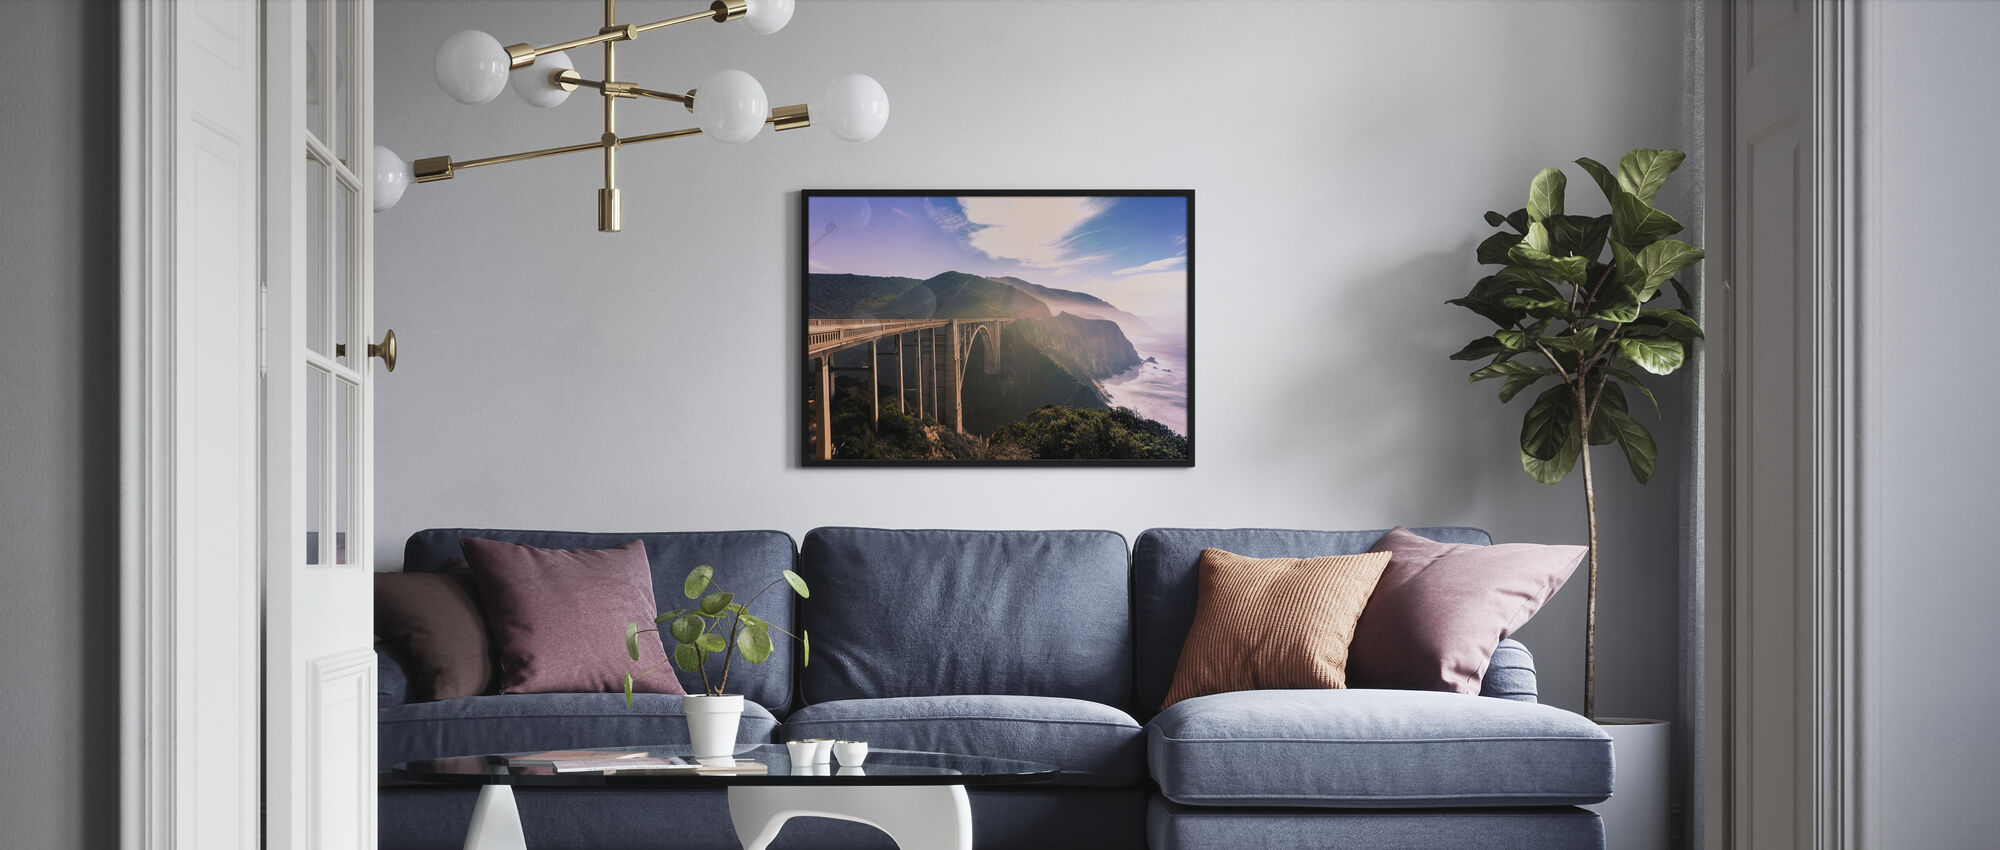 Monterey drömmar - Inramad tavla - Vardagsrum